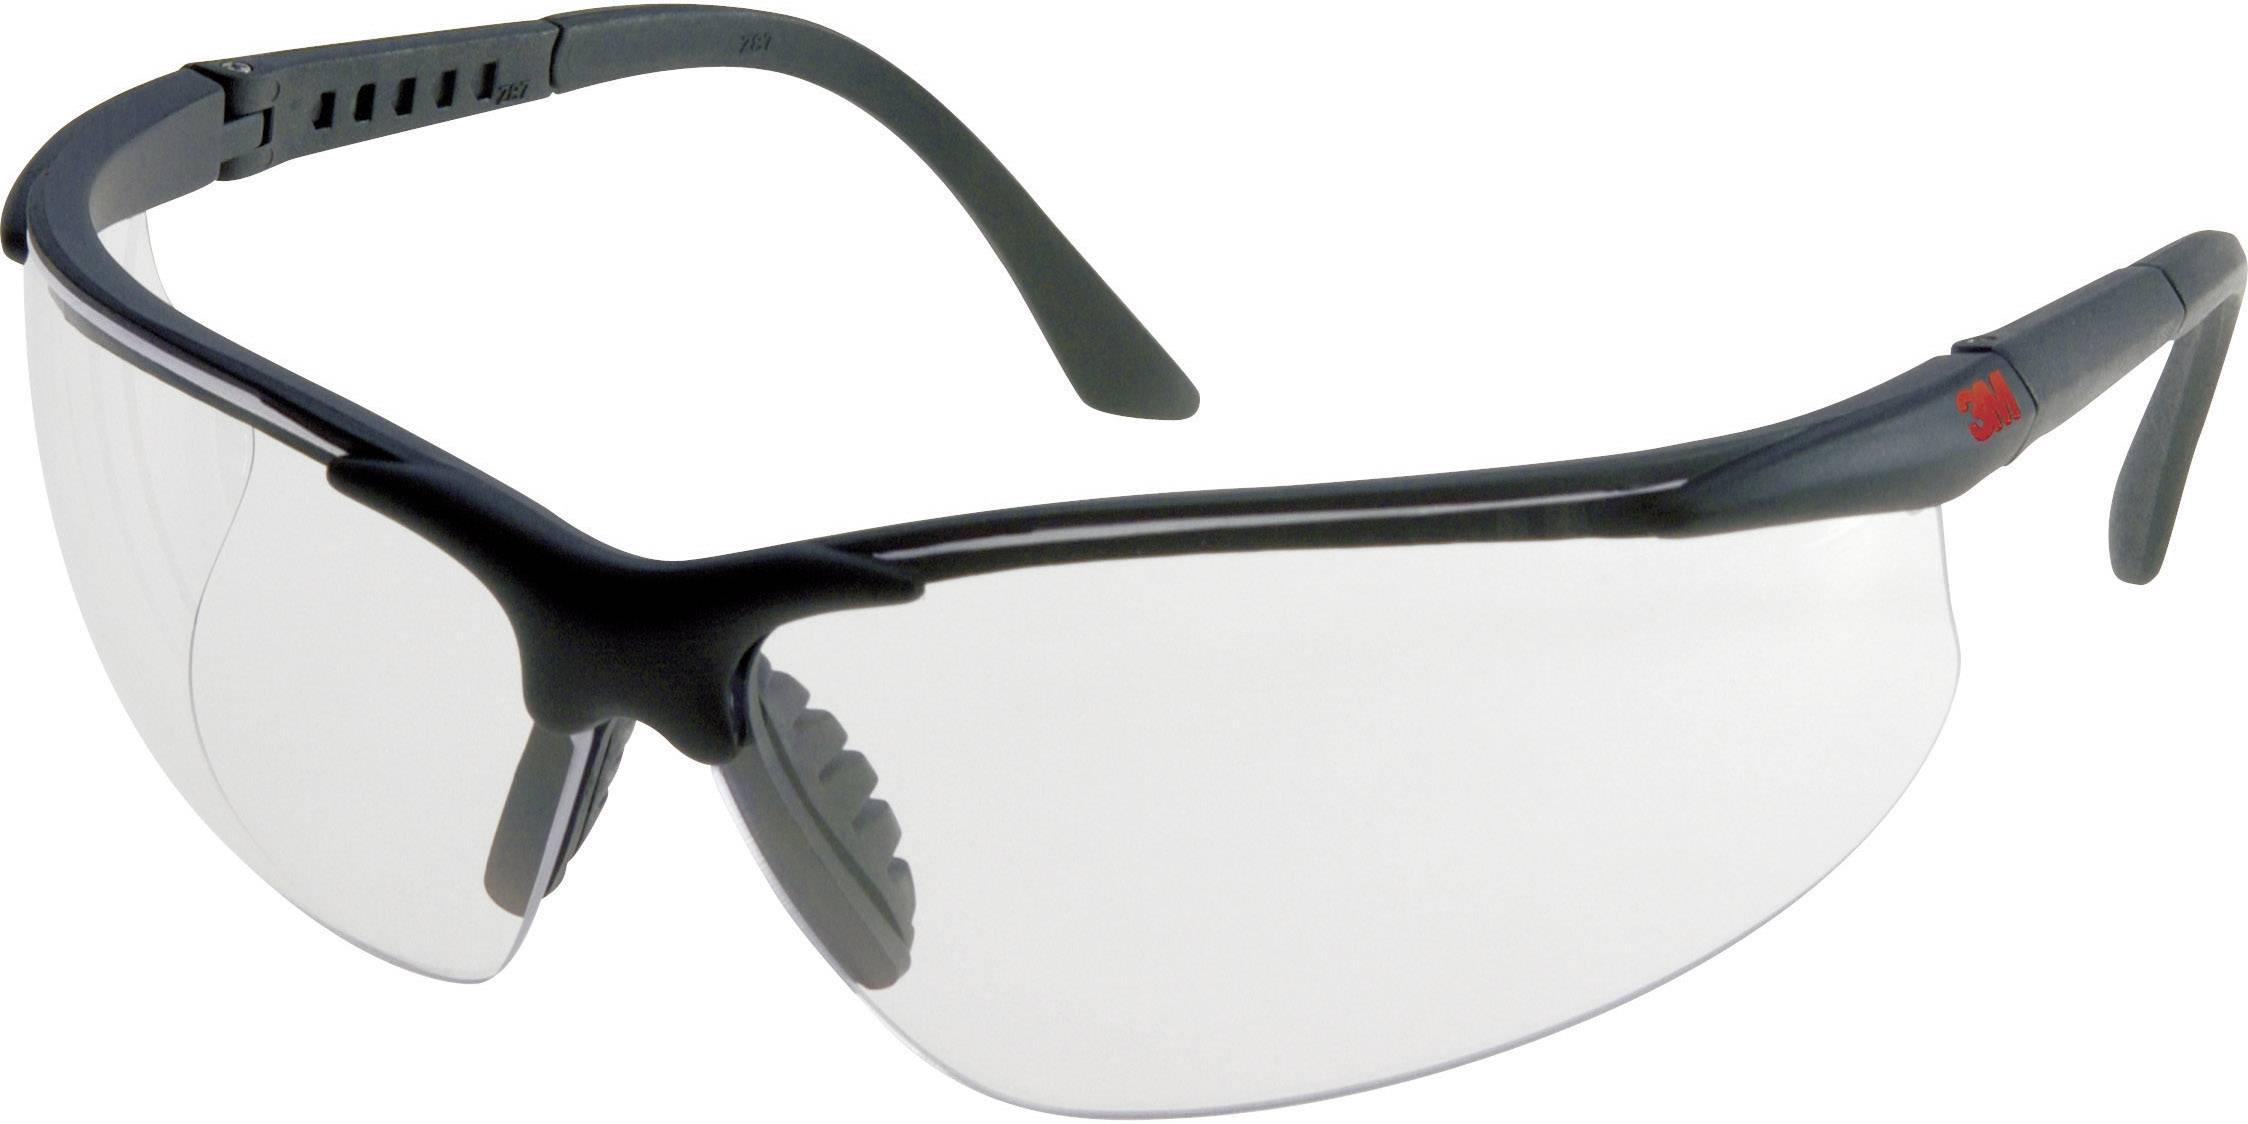 Bekend 3M 2750 Veiligheidsbril Zwart   Conrad.nl ON41